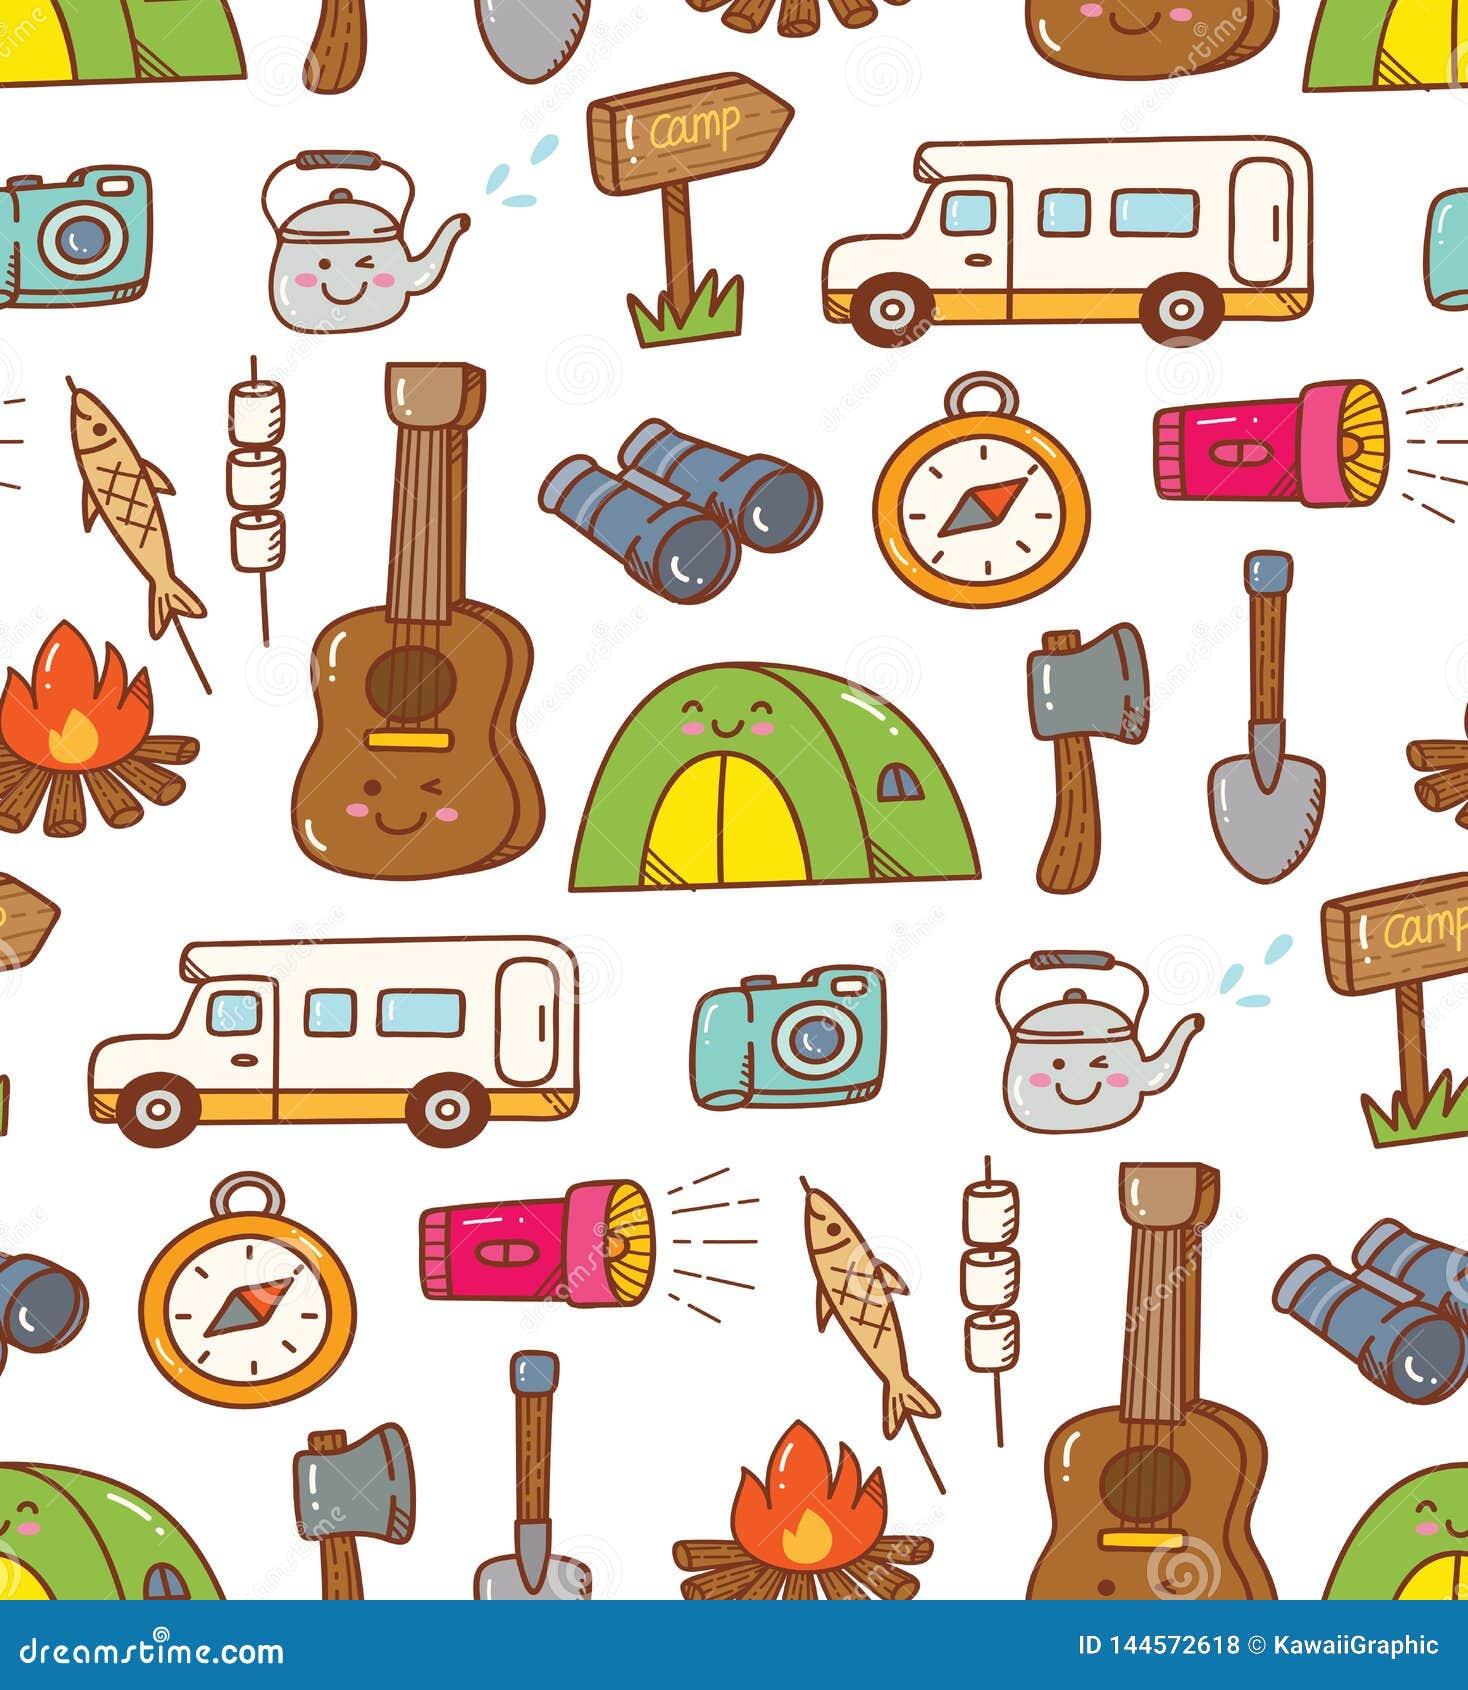 Camping Stuff Kawaii Doodle Seamless Background Stock Illustration Illustration Of Icon Backdrop 144572618